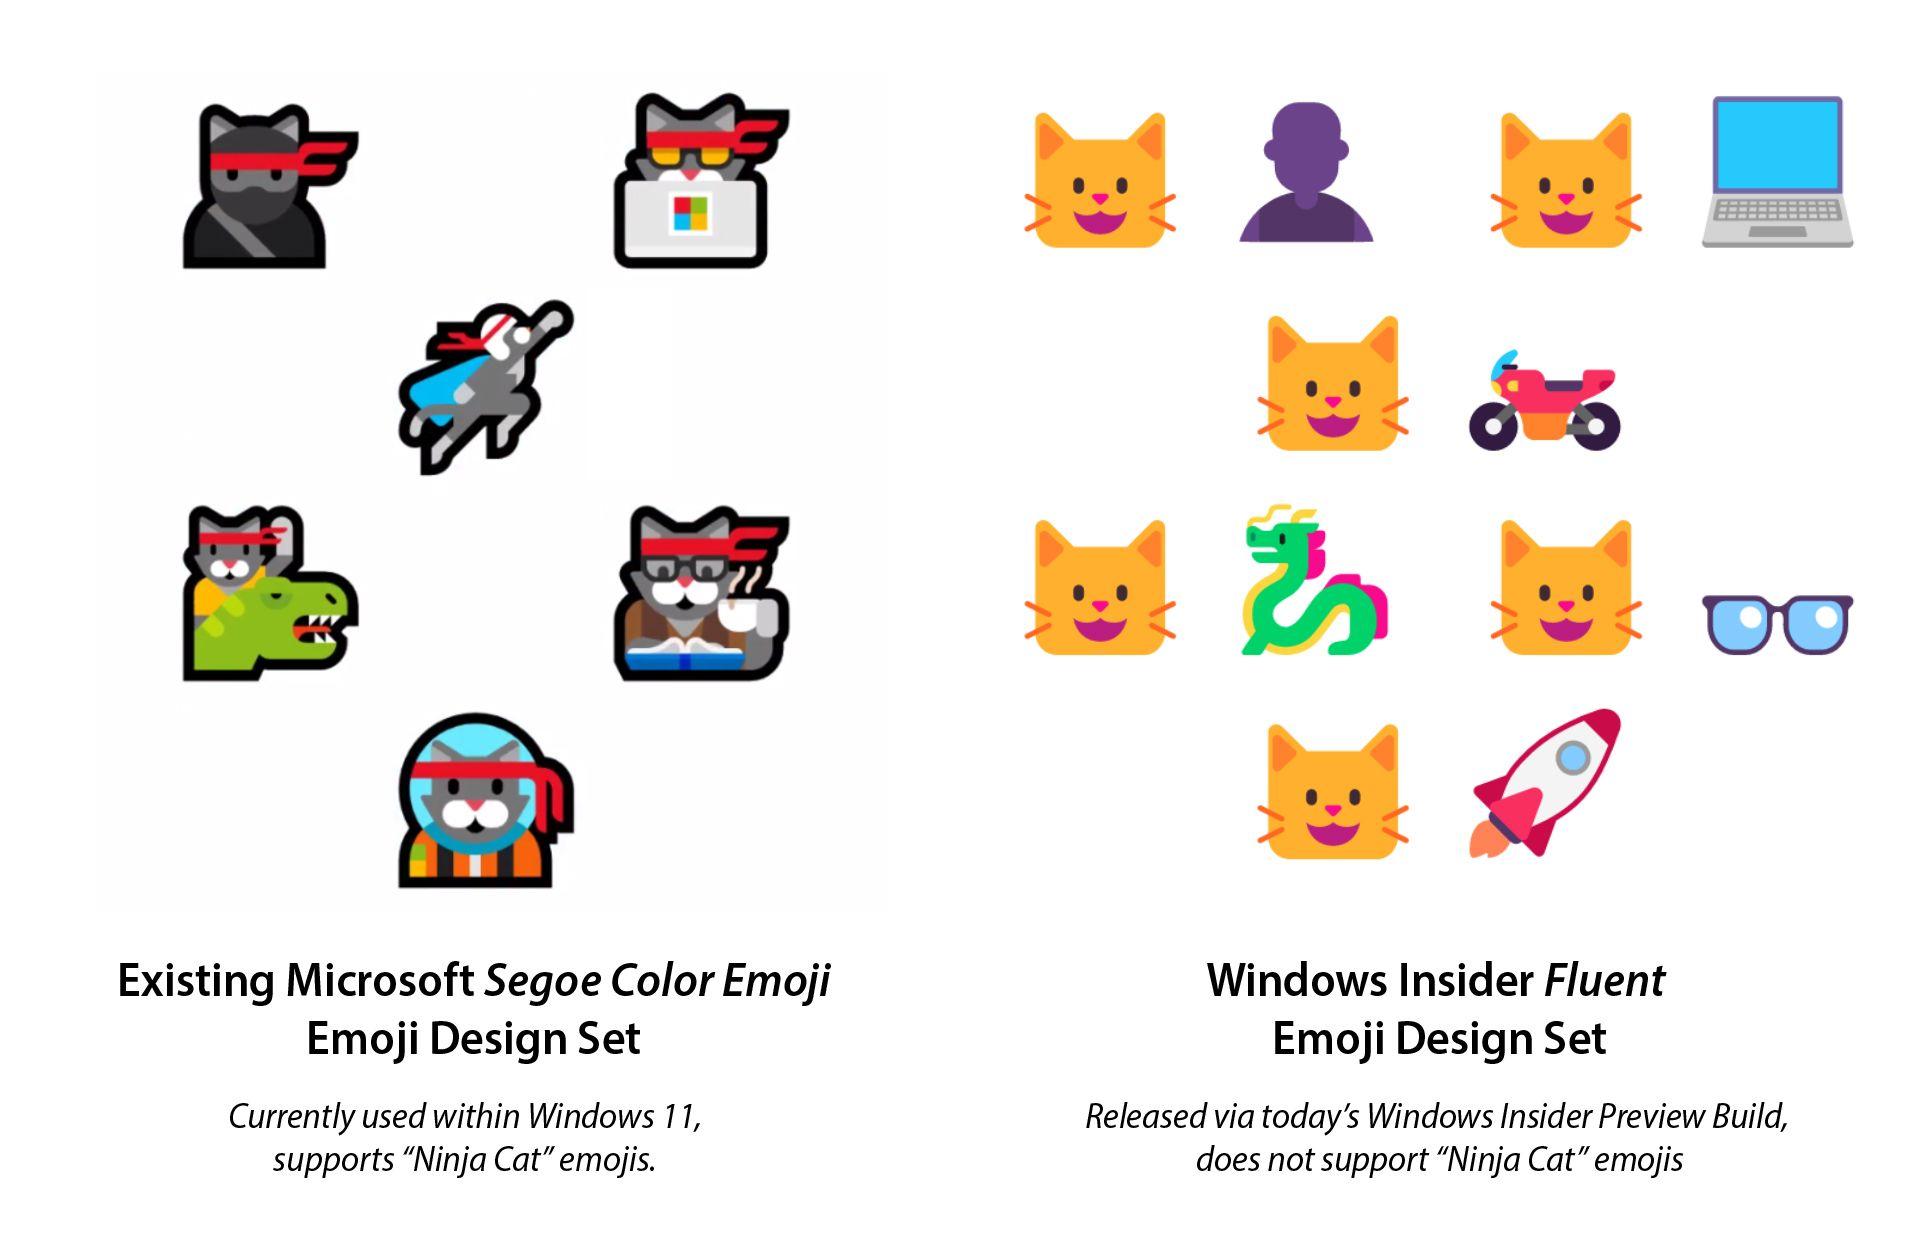 Emojipedia-Windows-11-Launch-Segoe-Fluent-Launch-NINJA-CAT-1